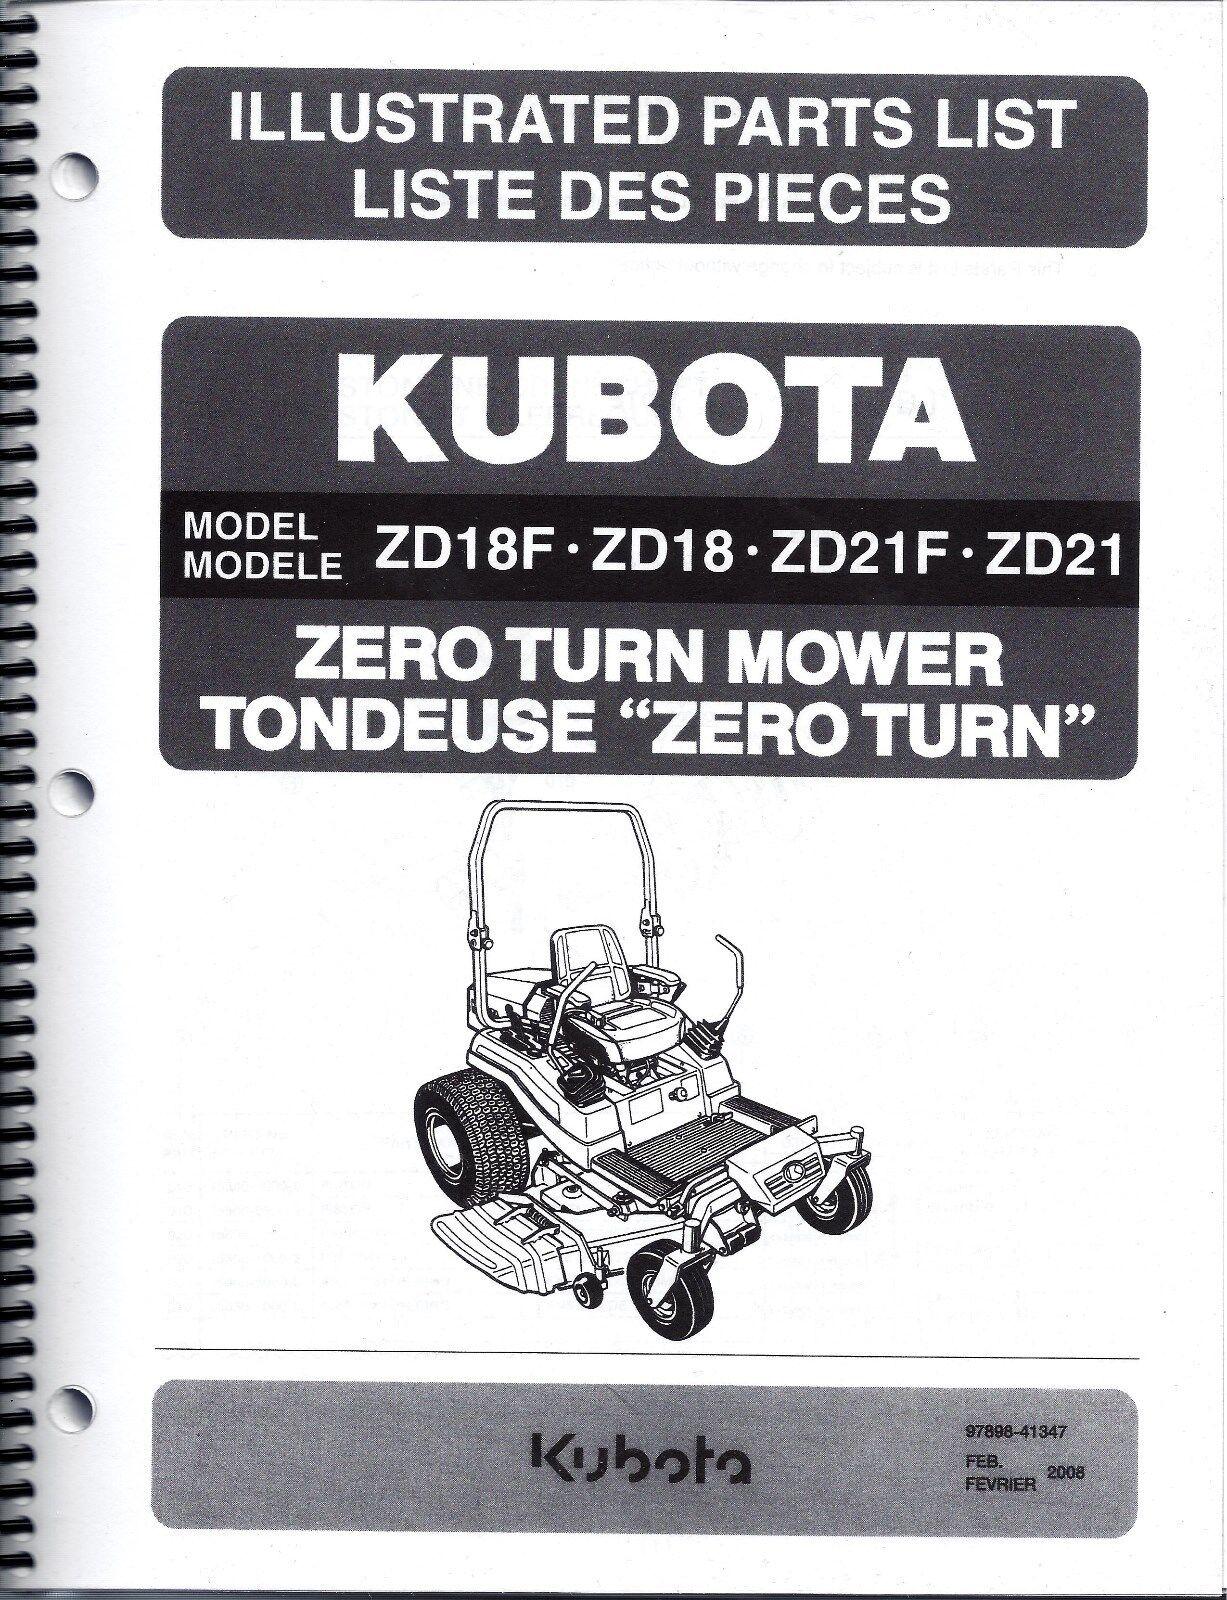 Kubota Zd21 Parts Diagram   Wiring Schematic Diagram on